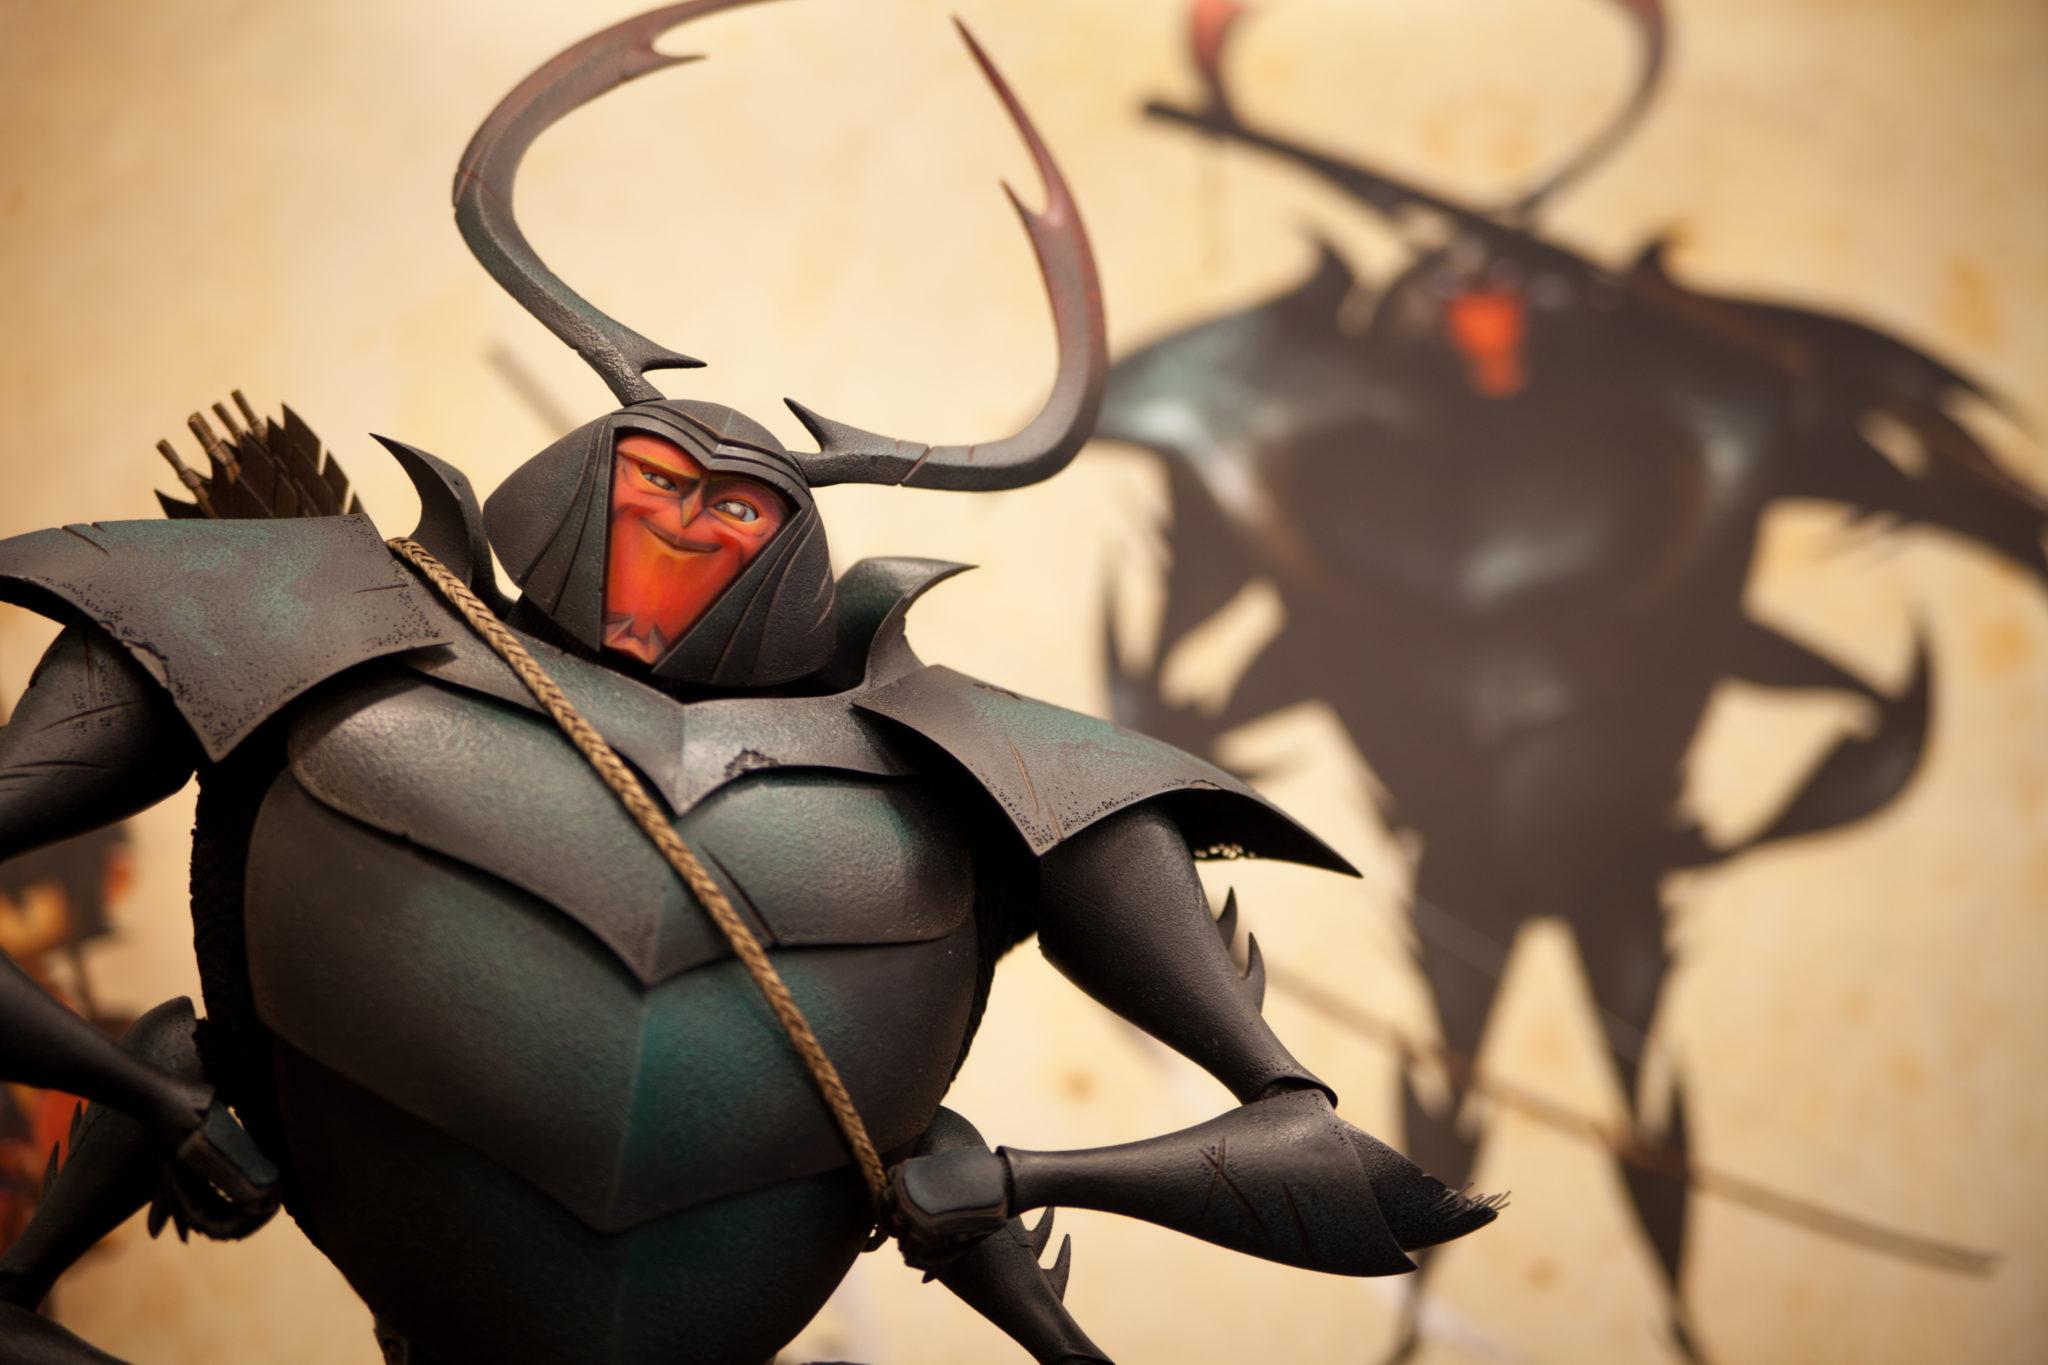 KUBO AND THE TWO STRINGS Kubo and the Two Strings – Set Visit beetle